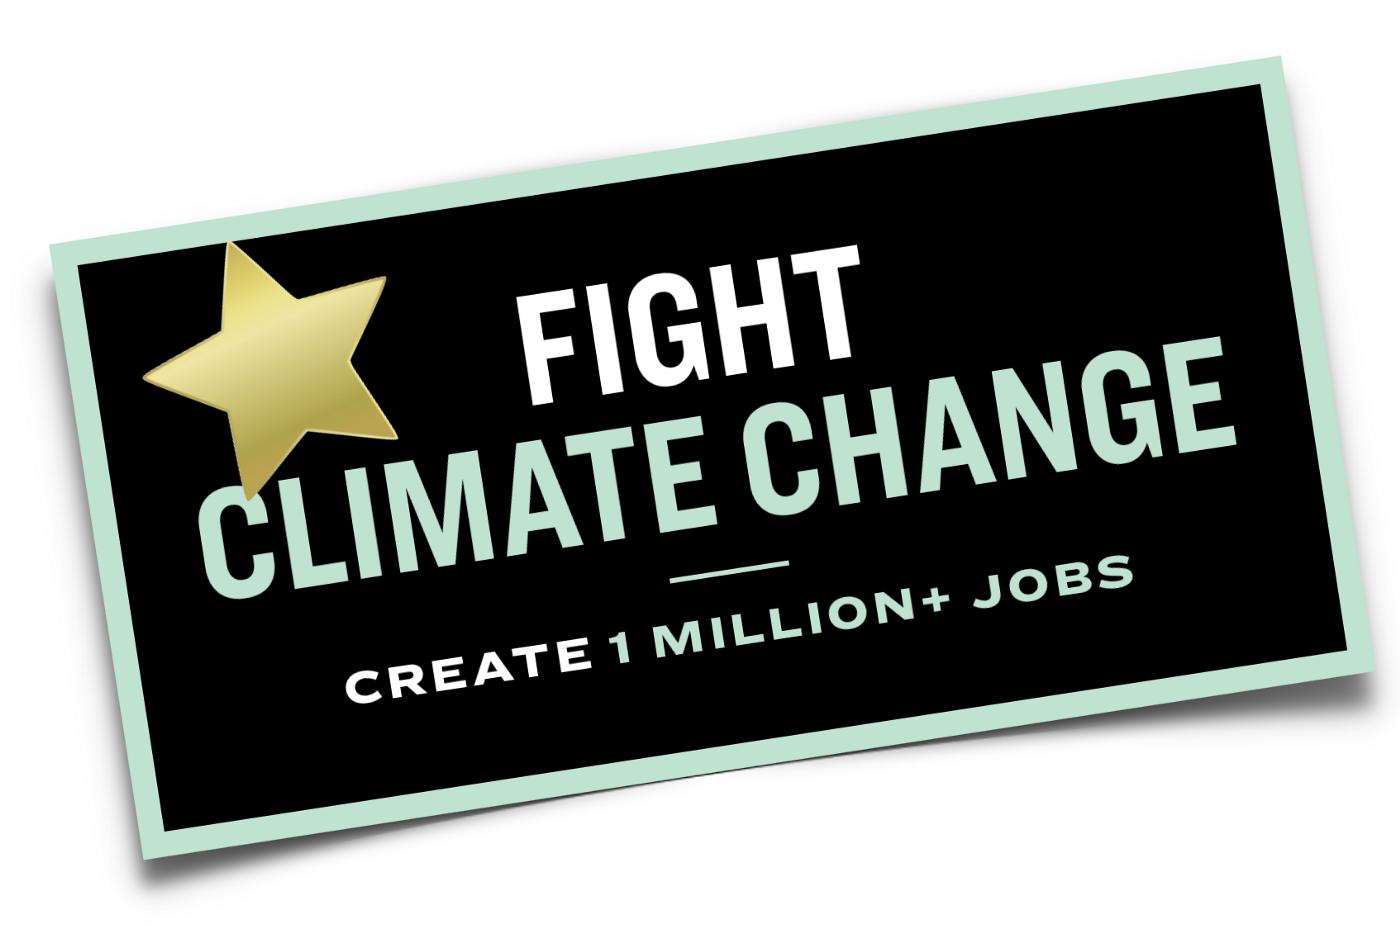 https://medium.com/@teamwarren/my-green-manufacturing-plan-for-america-fc0ad53ab614